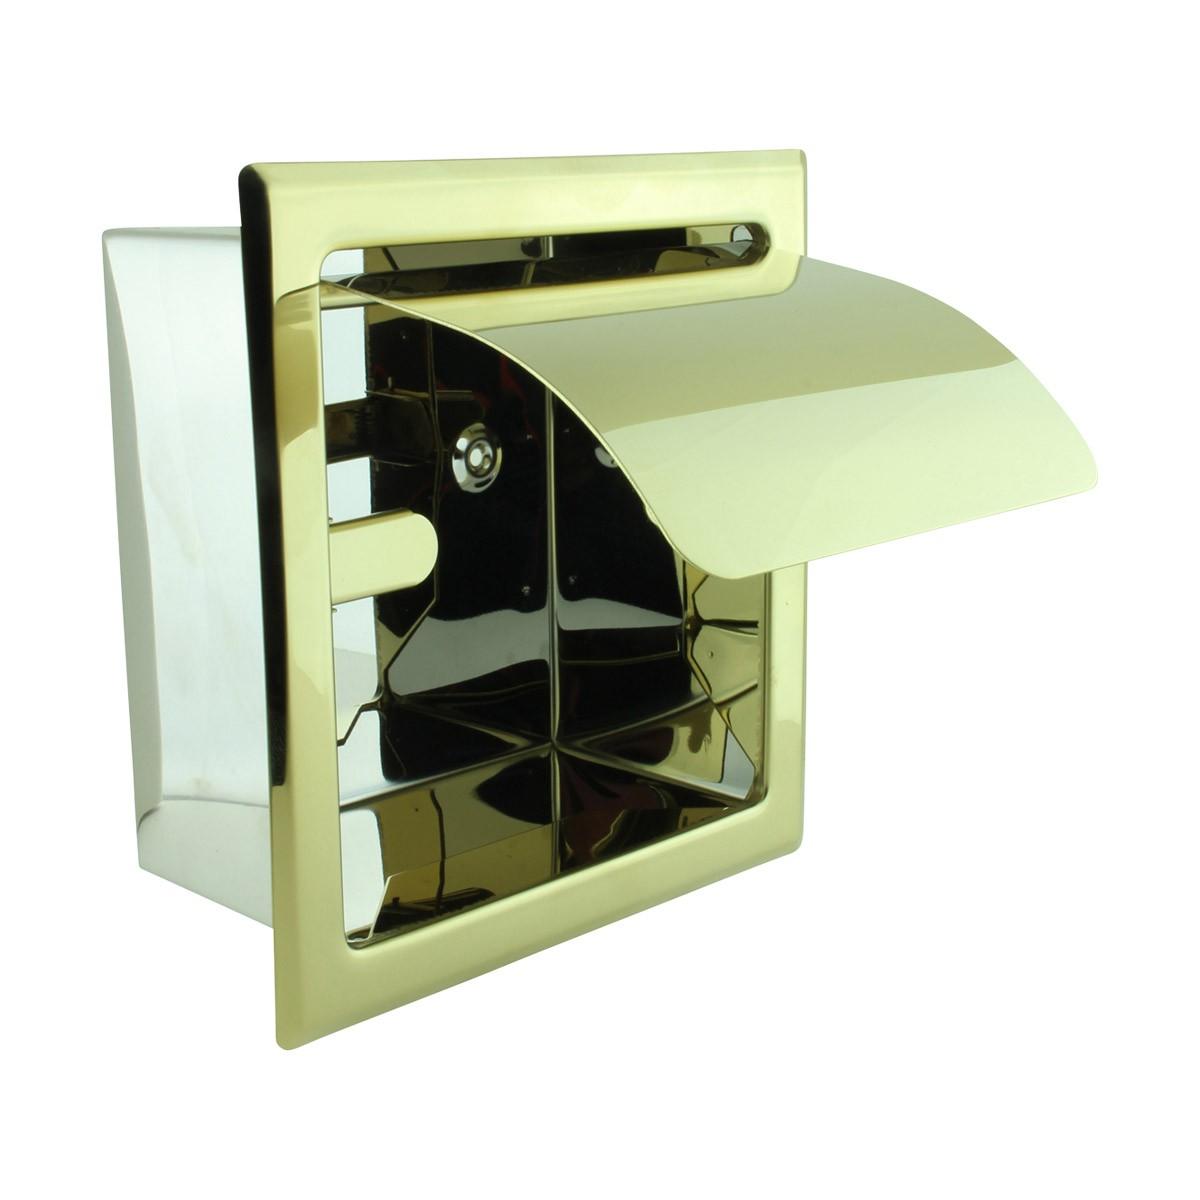 Recessed Toilet Paper Tissue Holder Gold Stainless Steel toilet paper holder Tissue Paper Holders toilet tissue holder